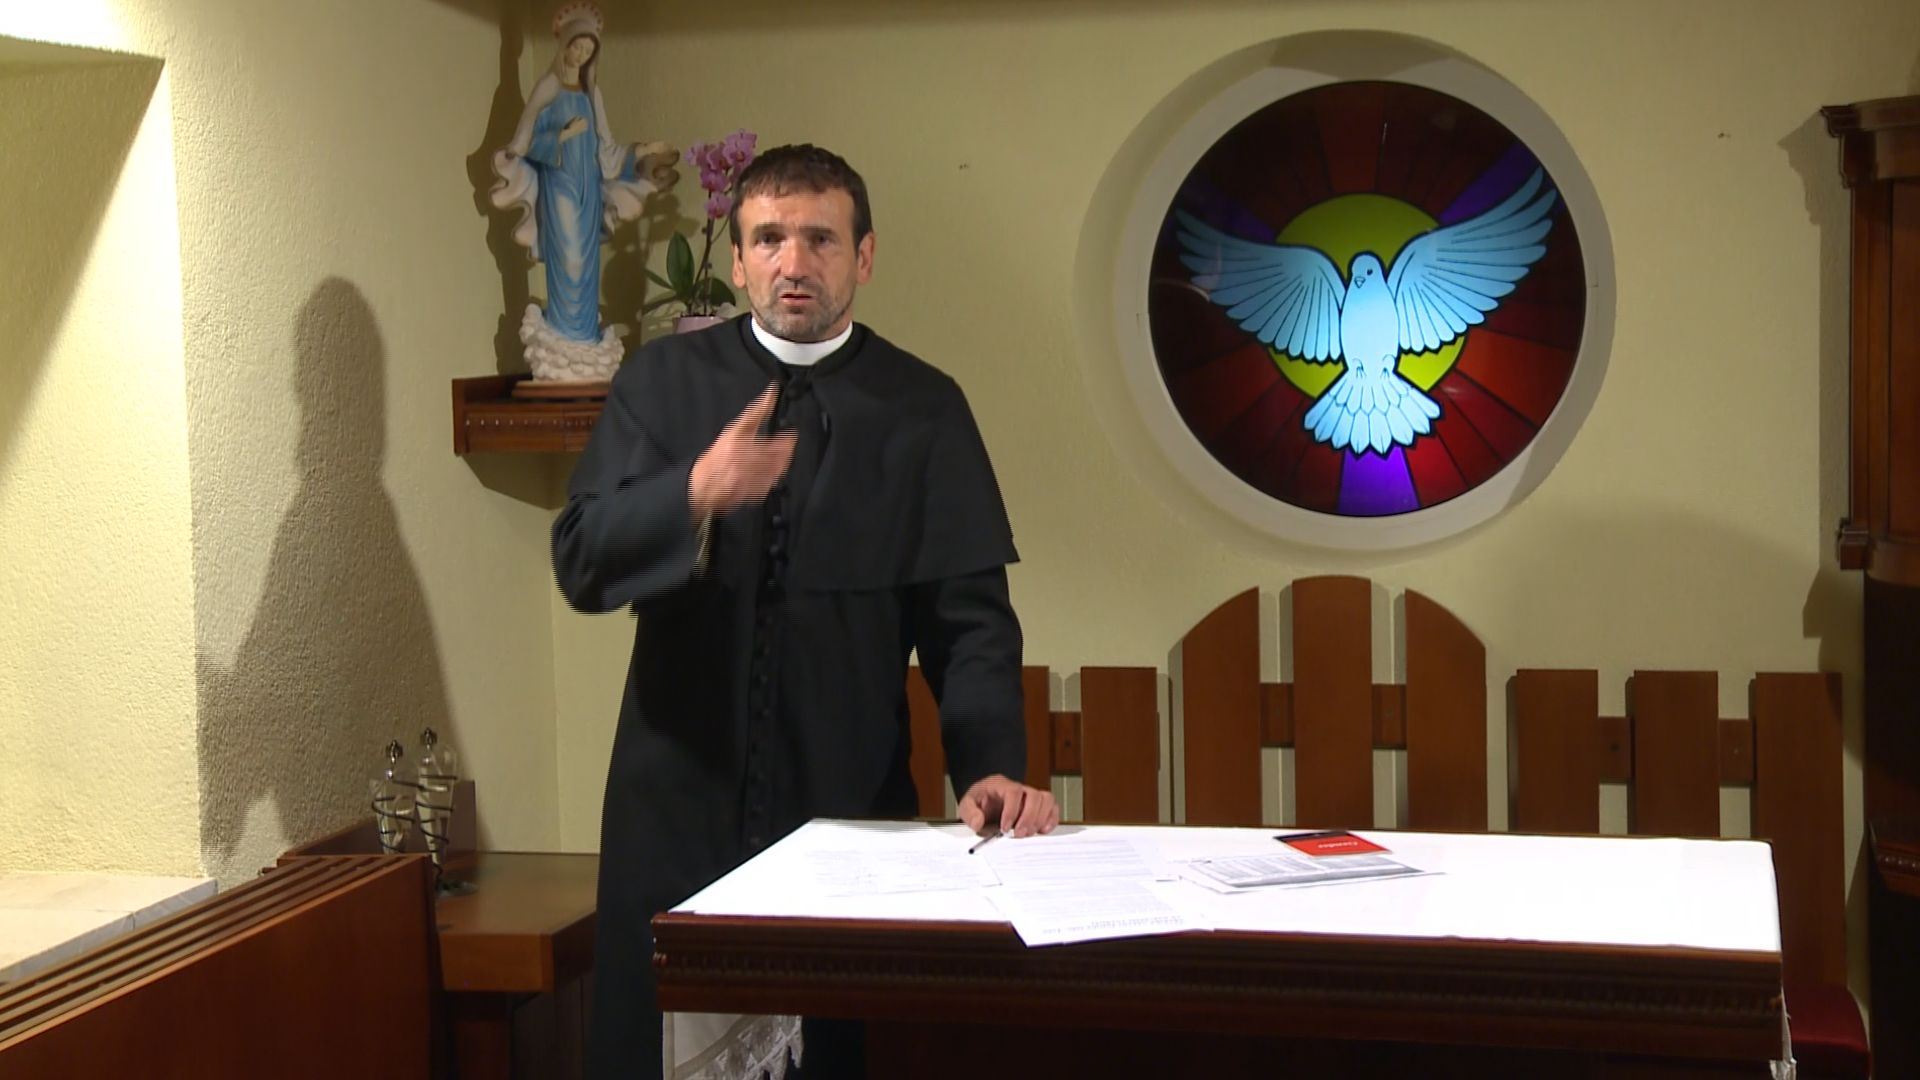 o.KUFFA – Čo je vlastne advent?